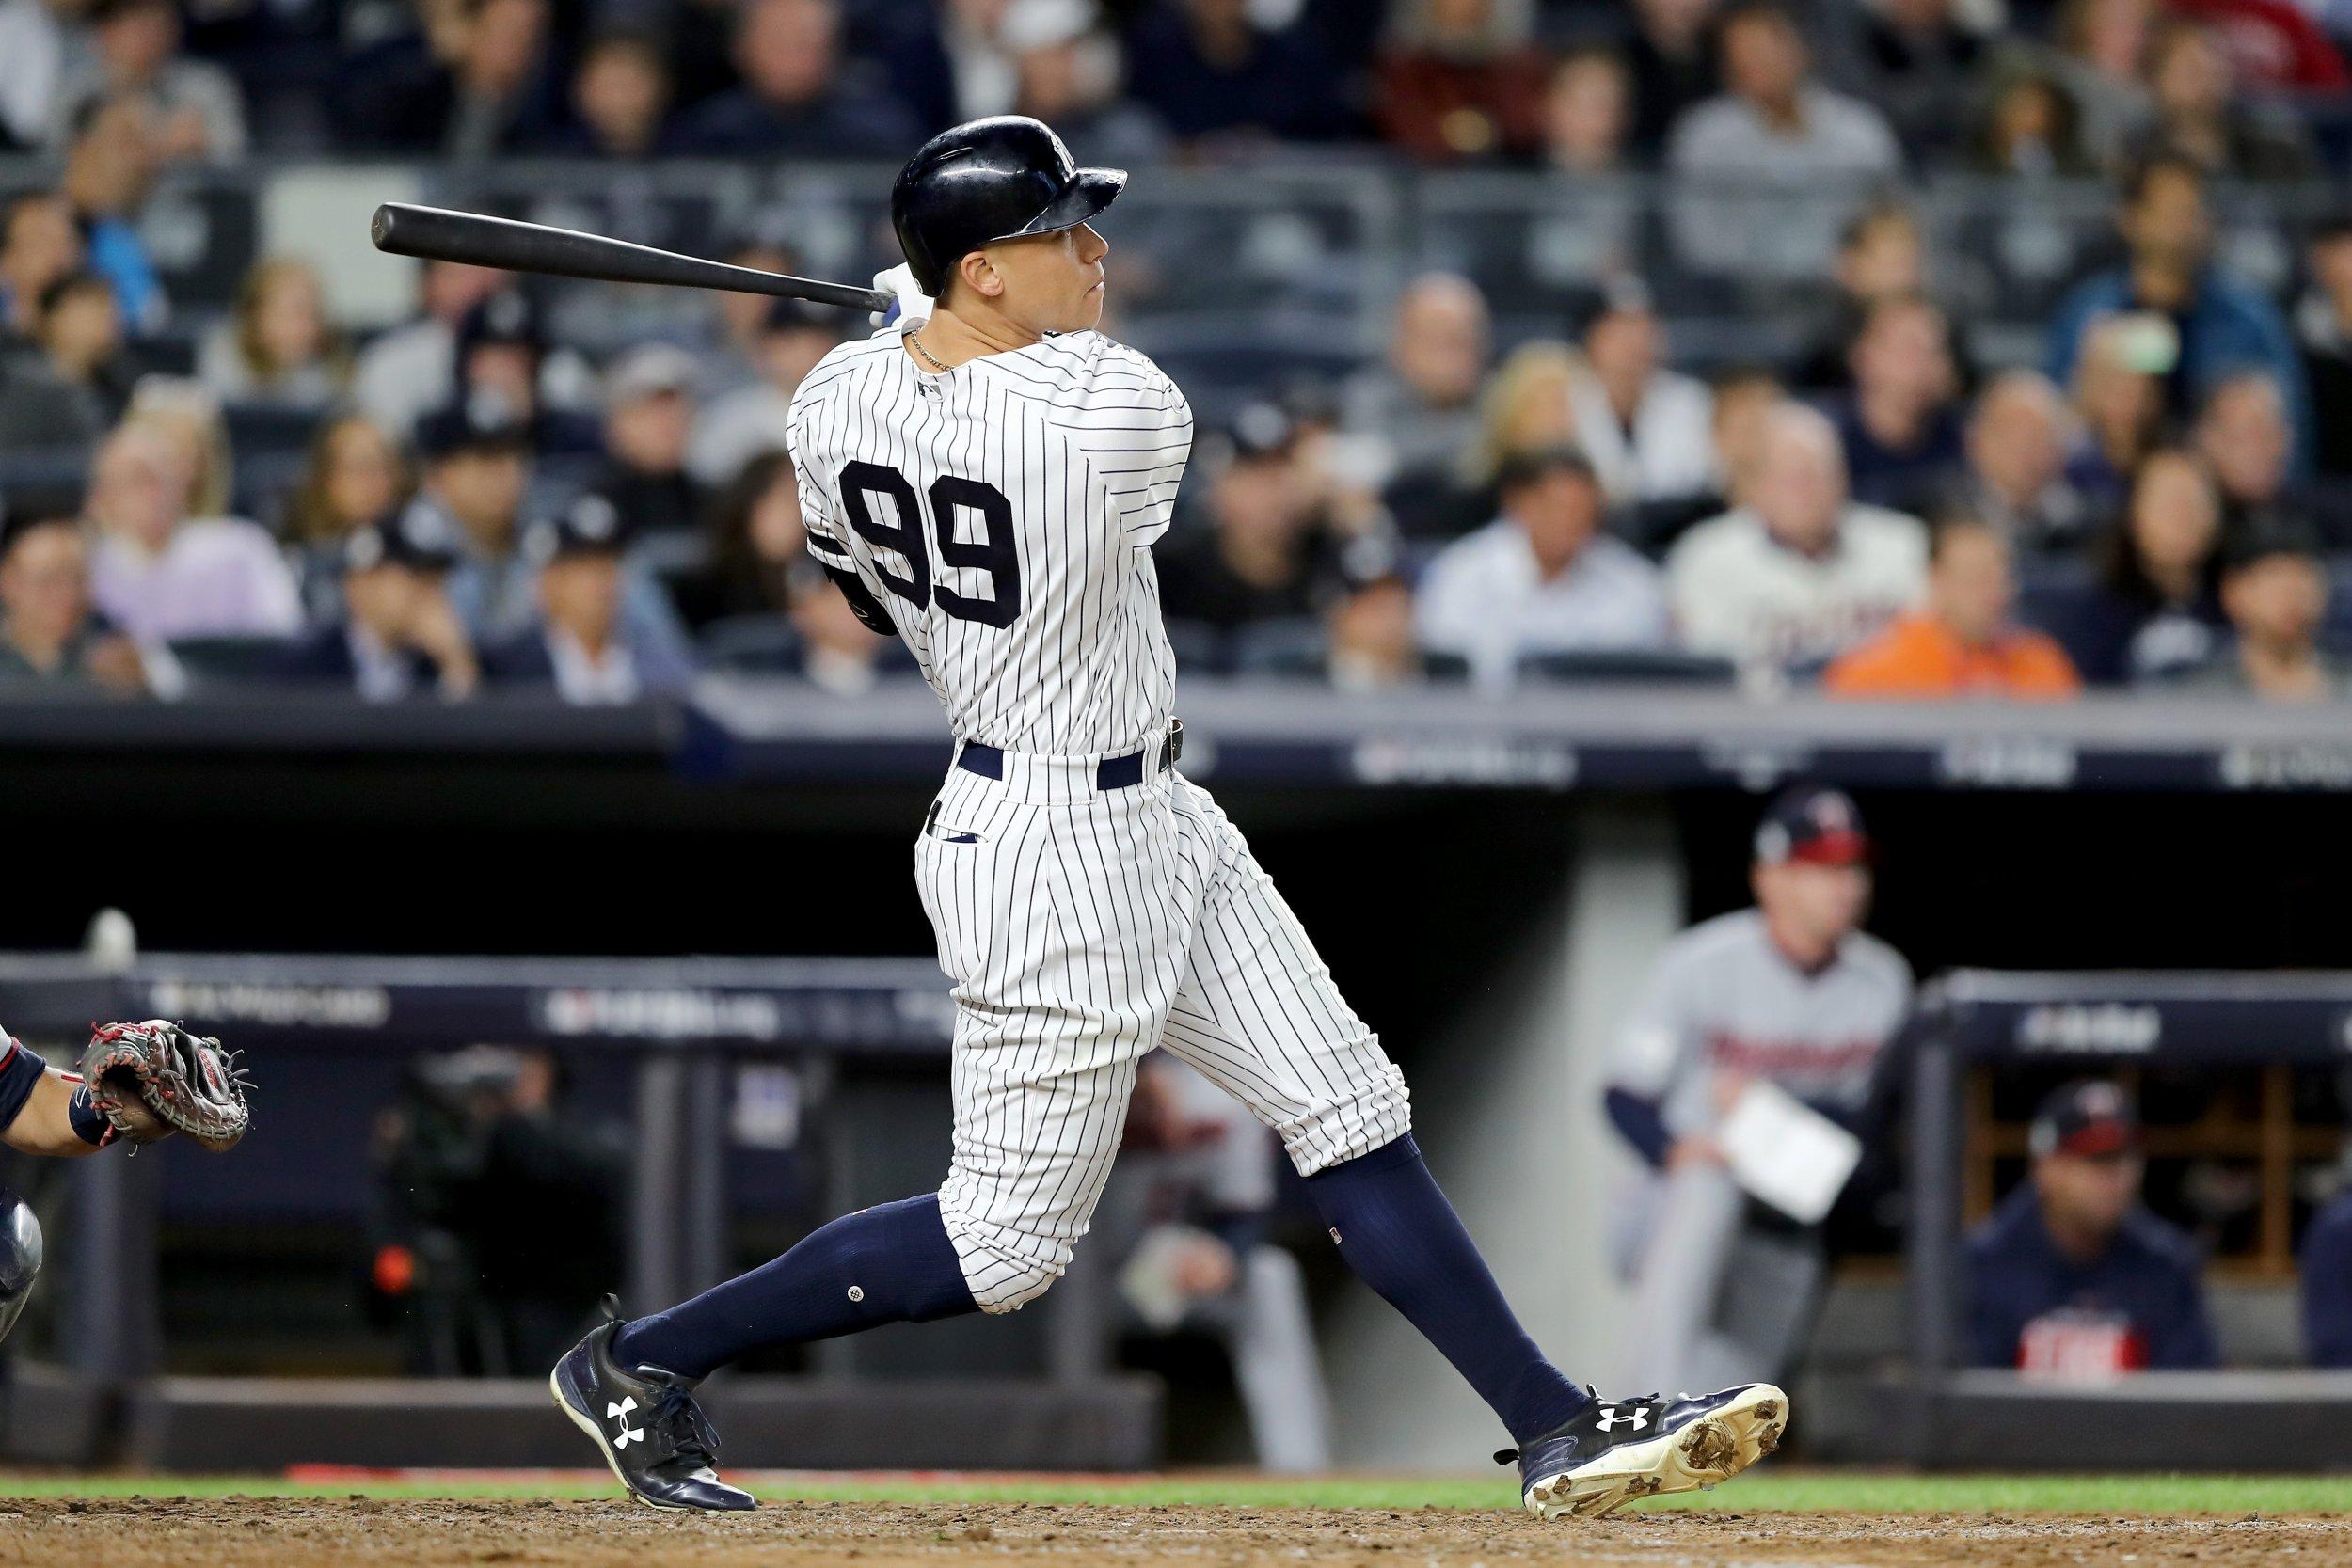 New York Yankees vs. Boston Red Sox Game 2 Score, Live ...Yankees